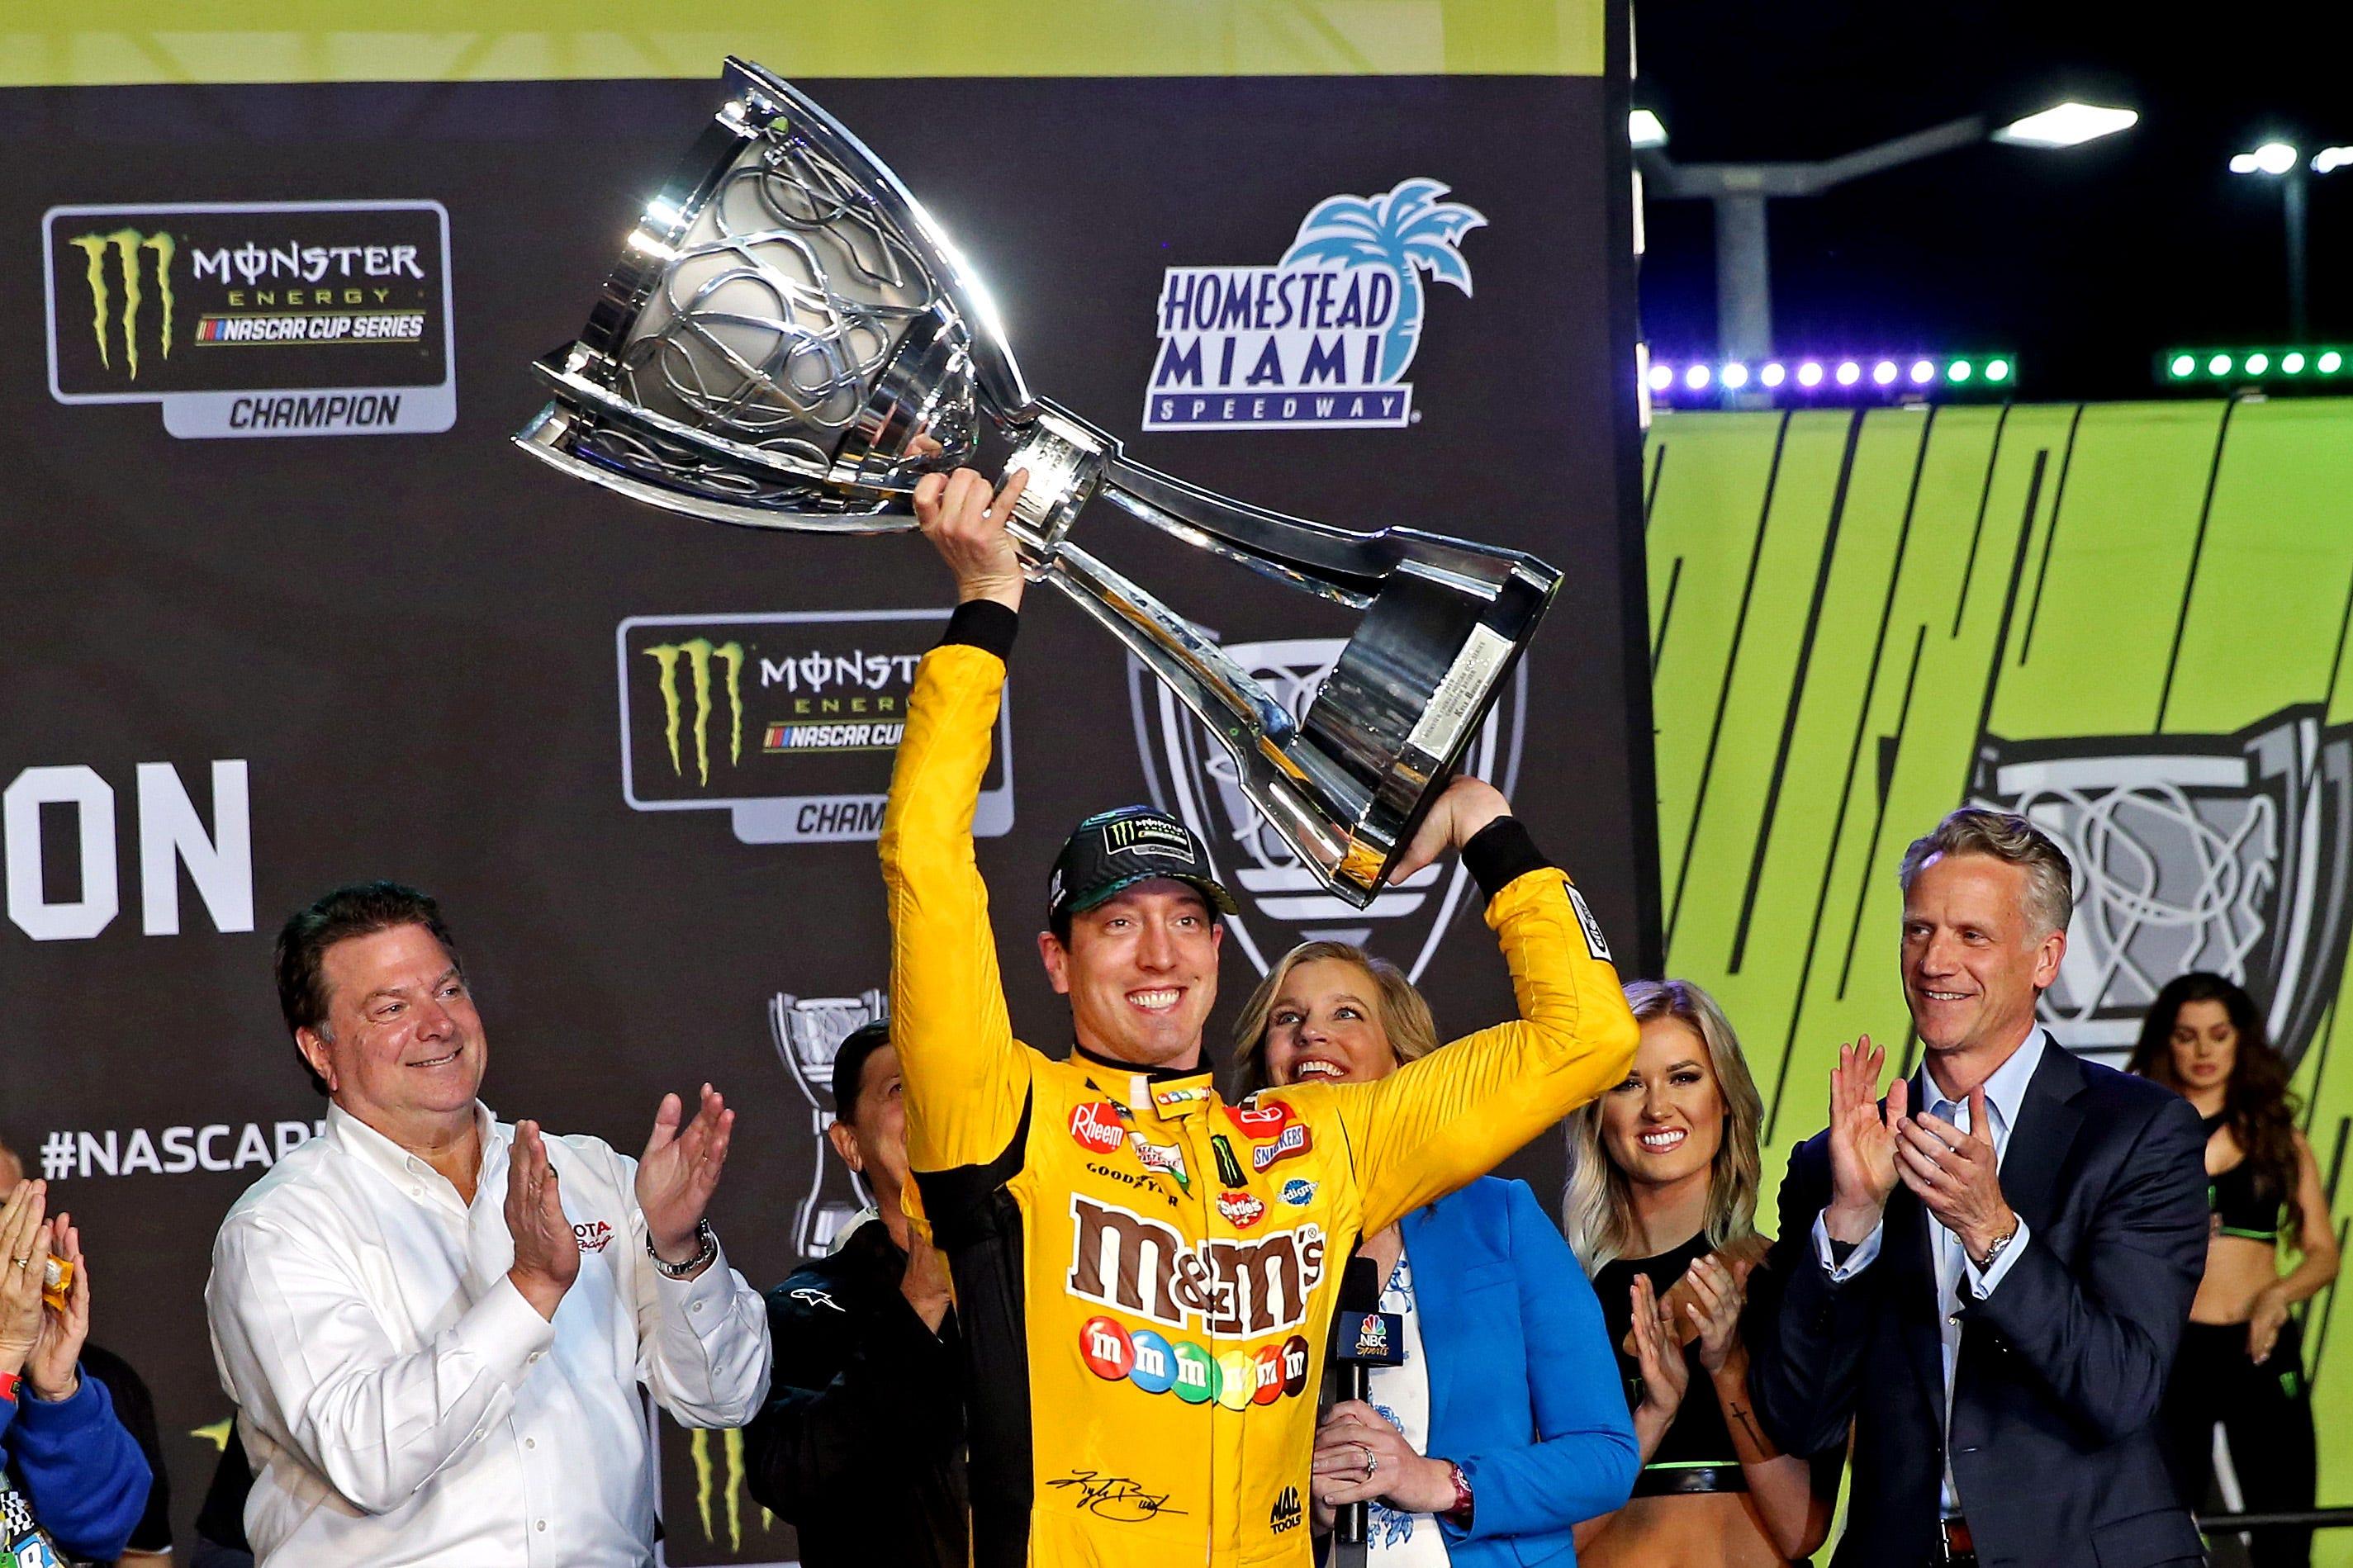 Kyle Busch, NASCAR champion